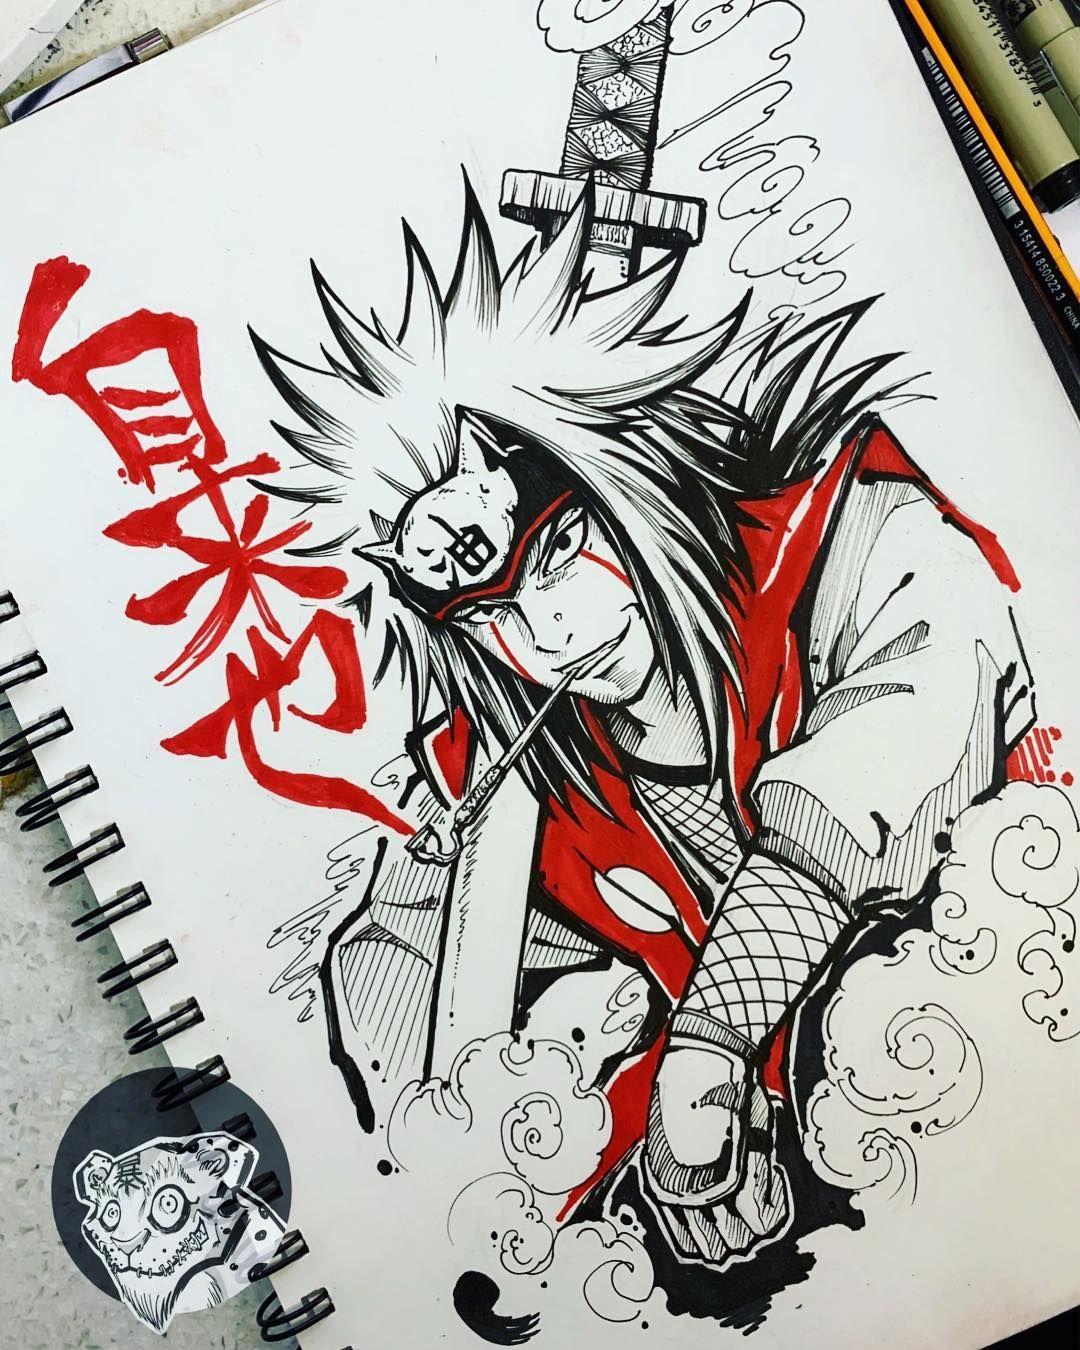 Ink Drawing Illustration Art Arte Draw Geektattoo Geek Manga Mangatattoo Anime Animetattoo Otaku Onep Naruto Sketch Naruto Tattoo Naruto Drawings